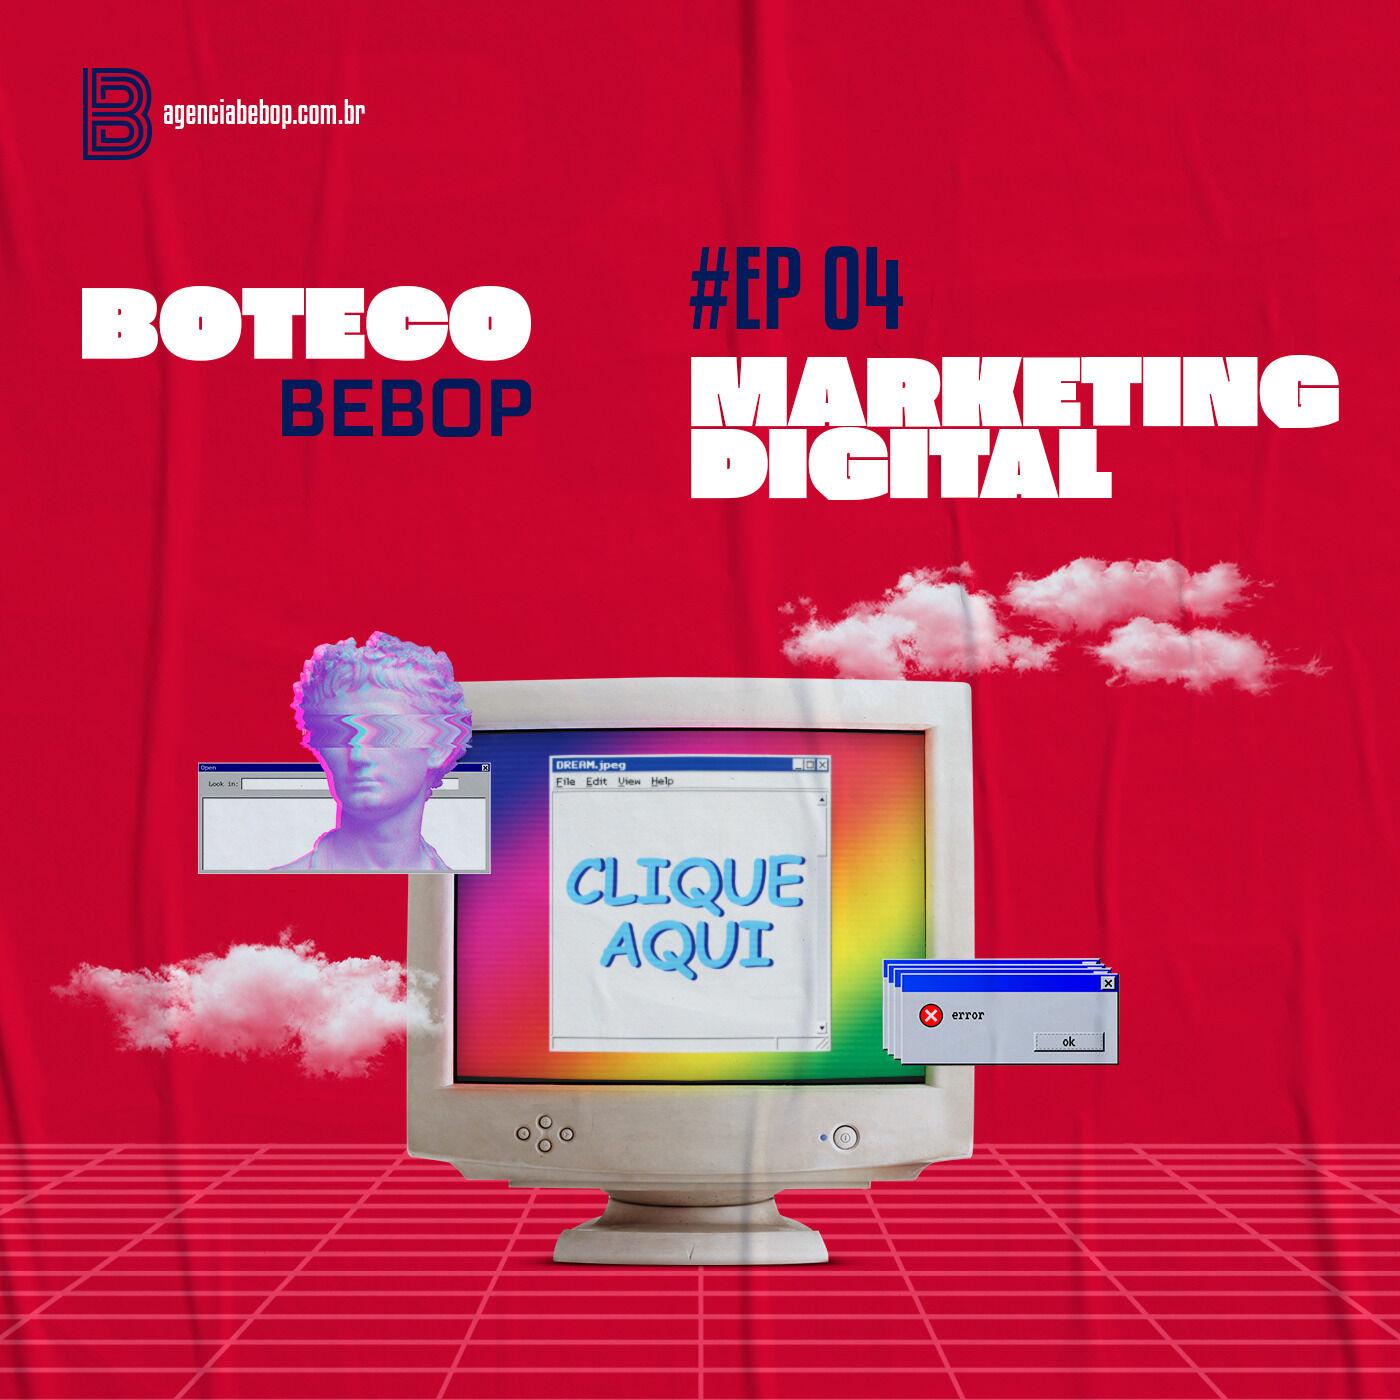 #EP 04 - Boteco Bebop | Marketing Digital